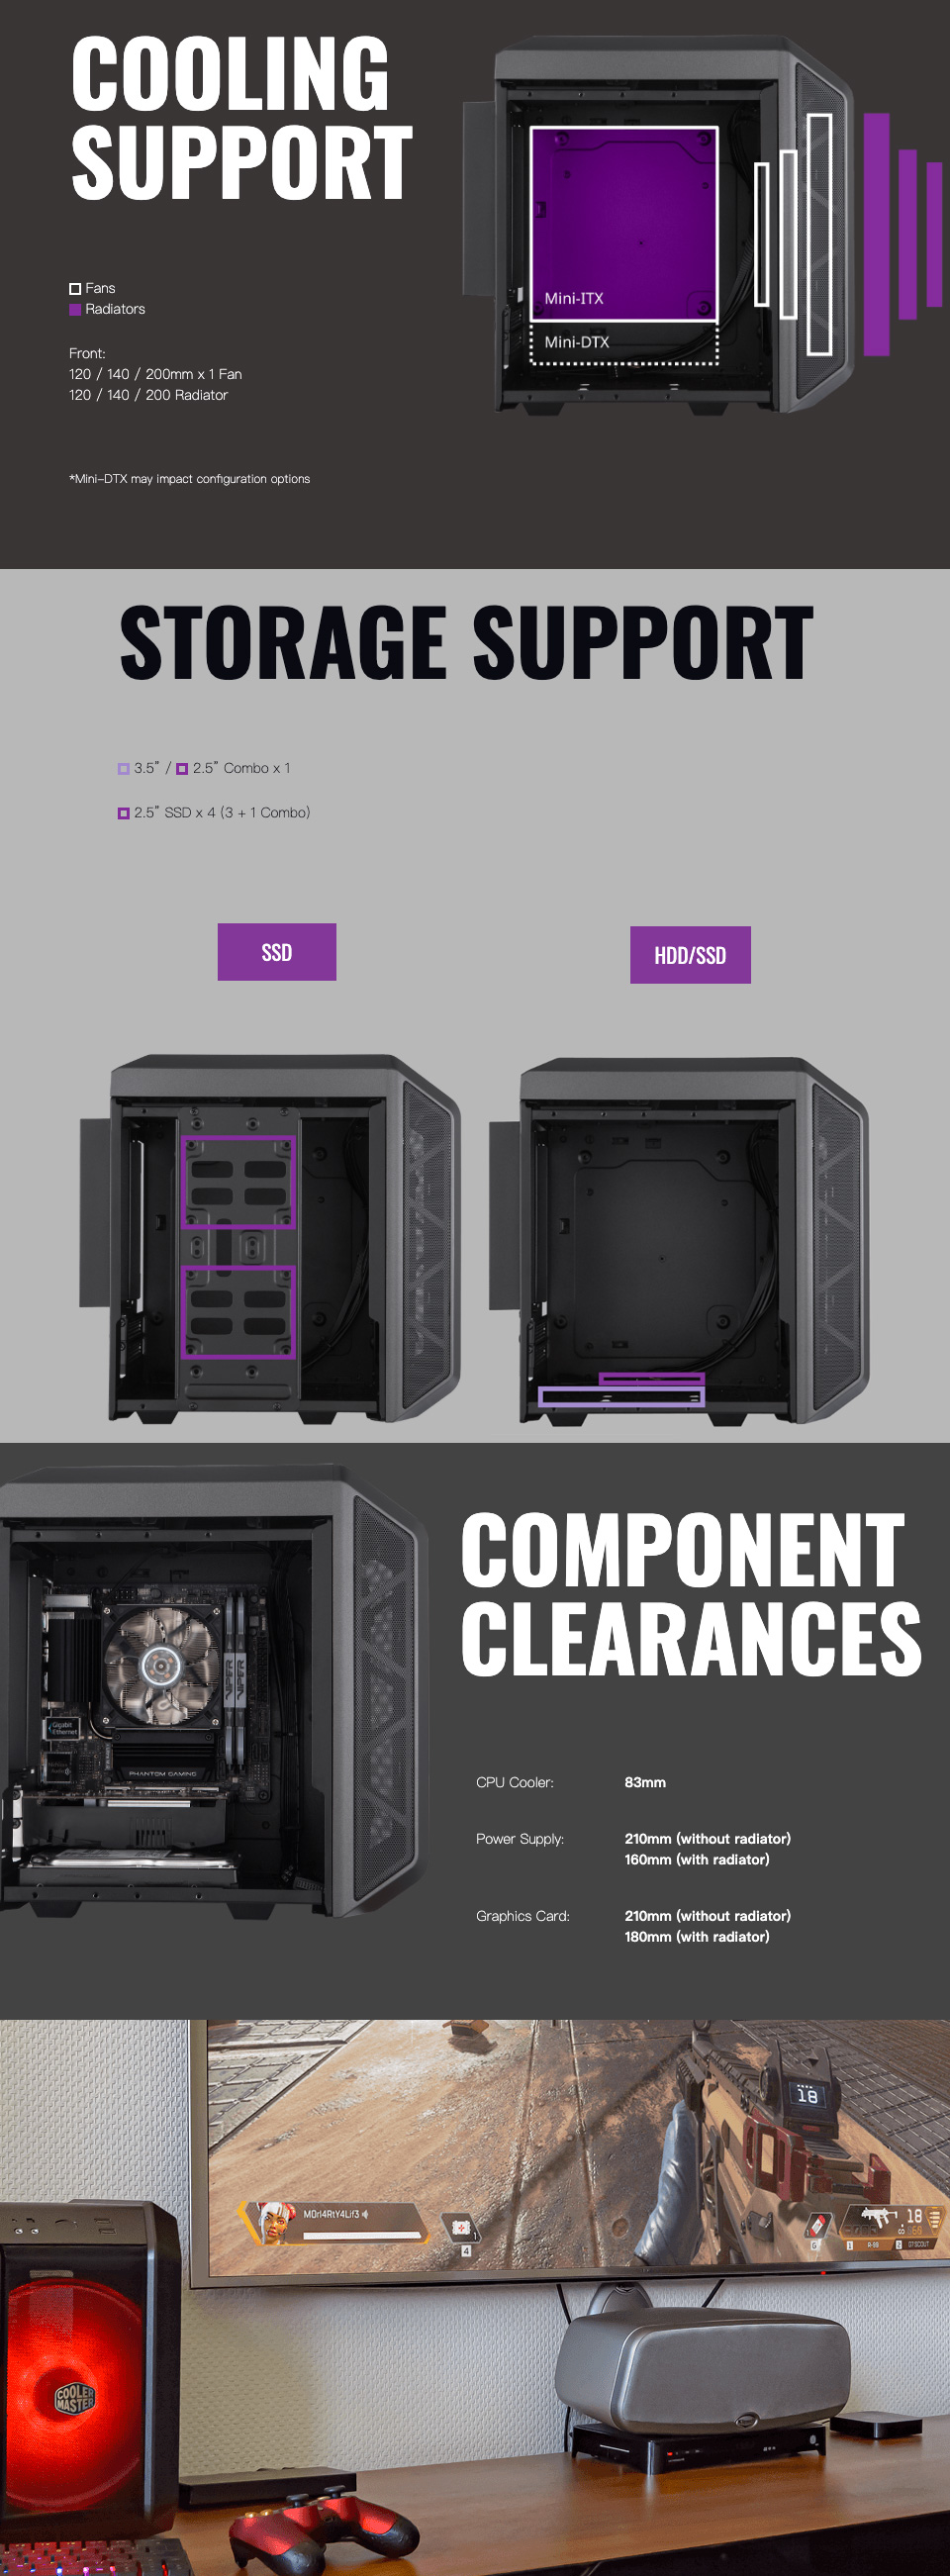 Cooler Master MasterCase H100 Mini-ITX Case features 3